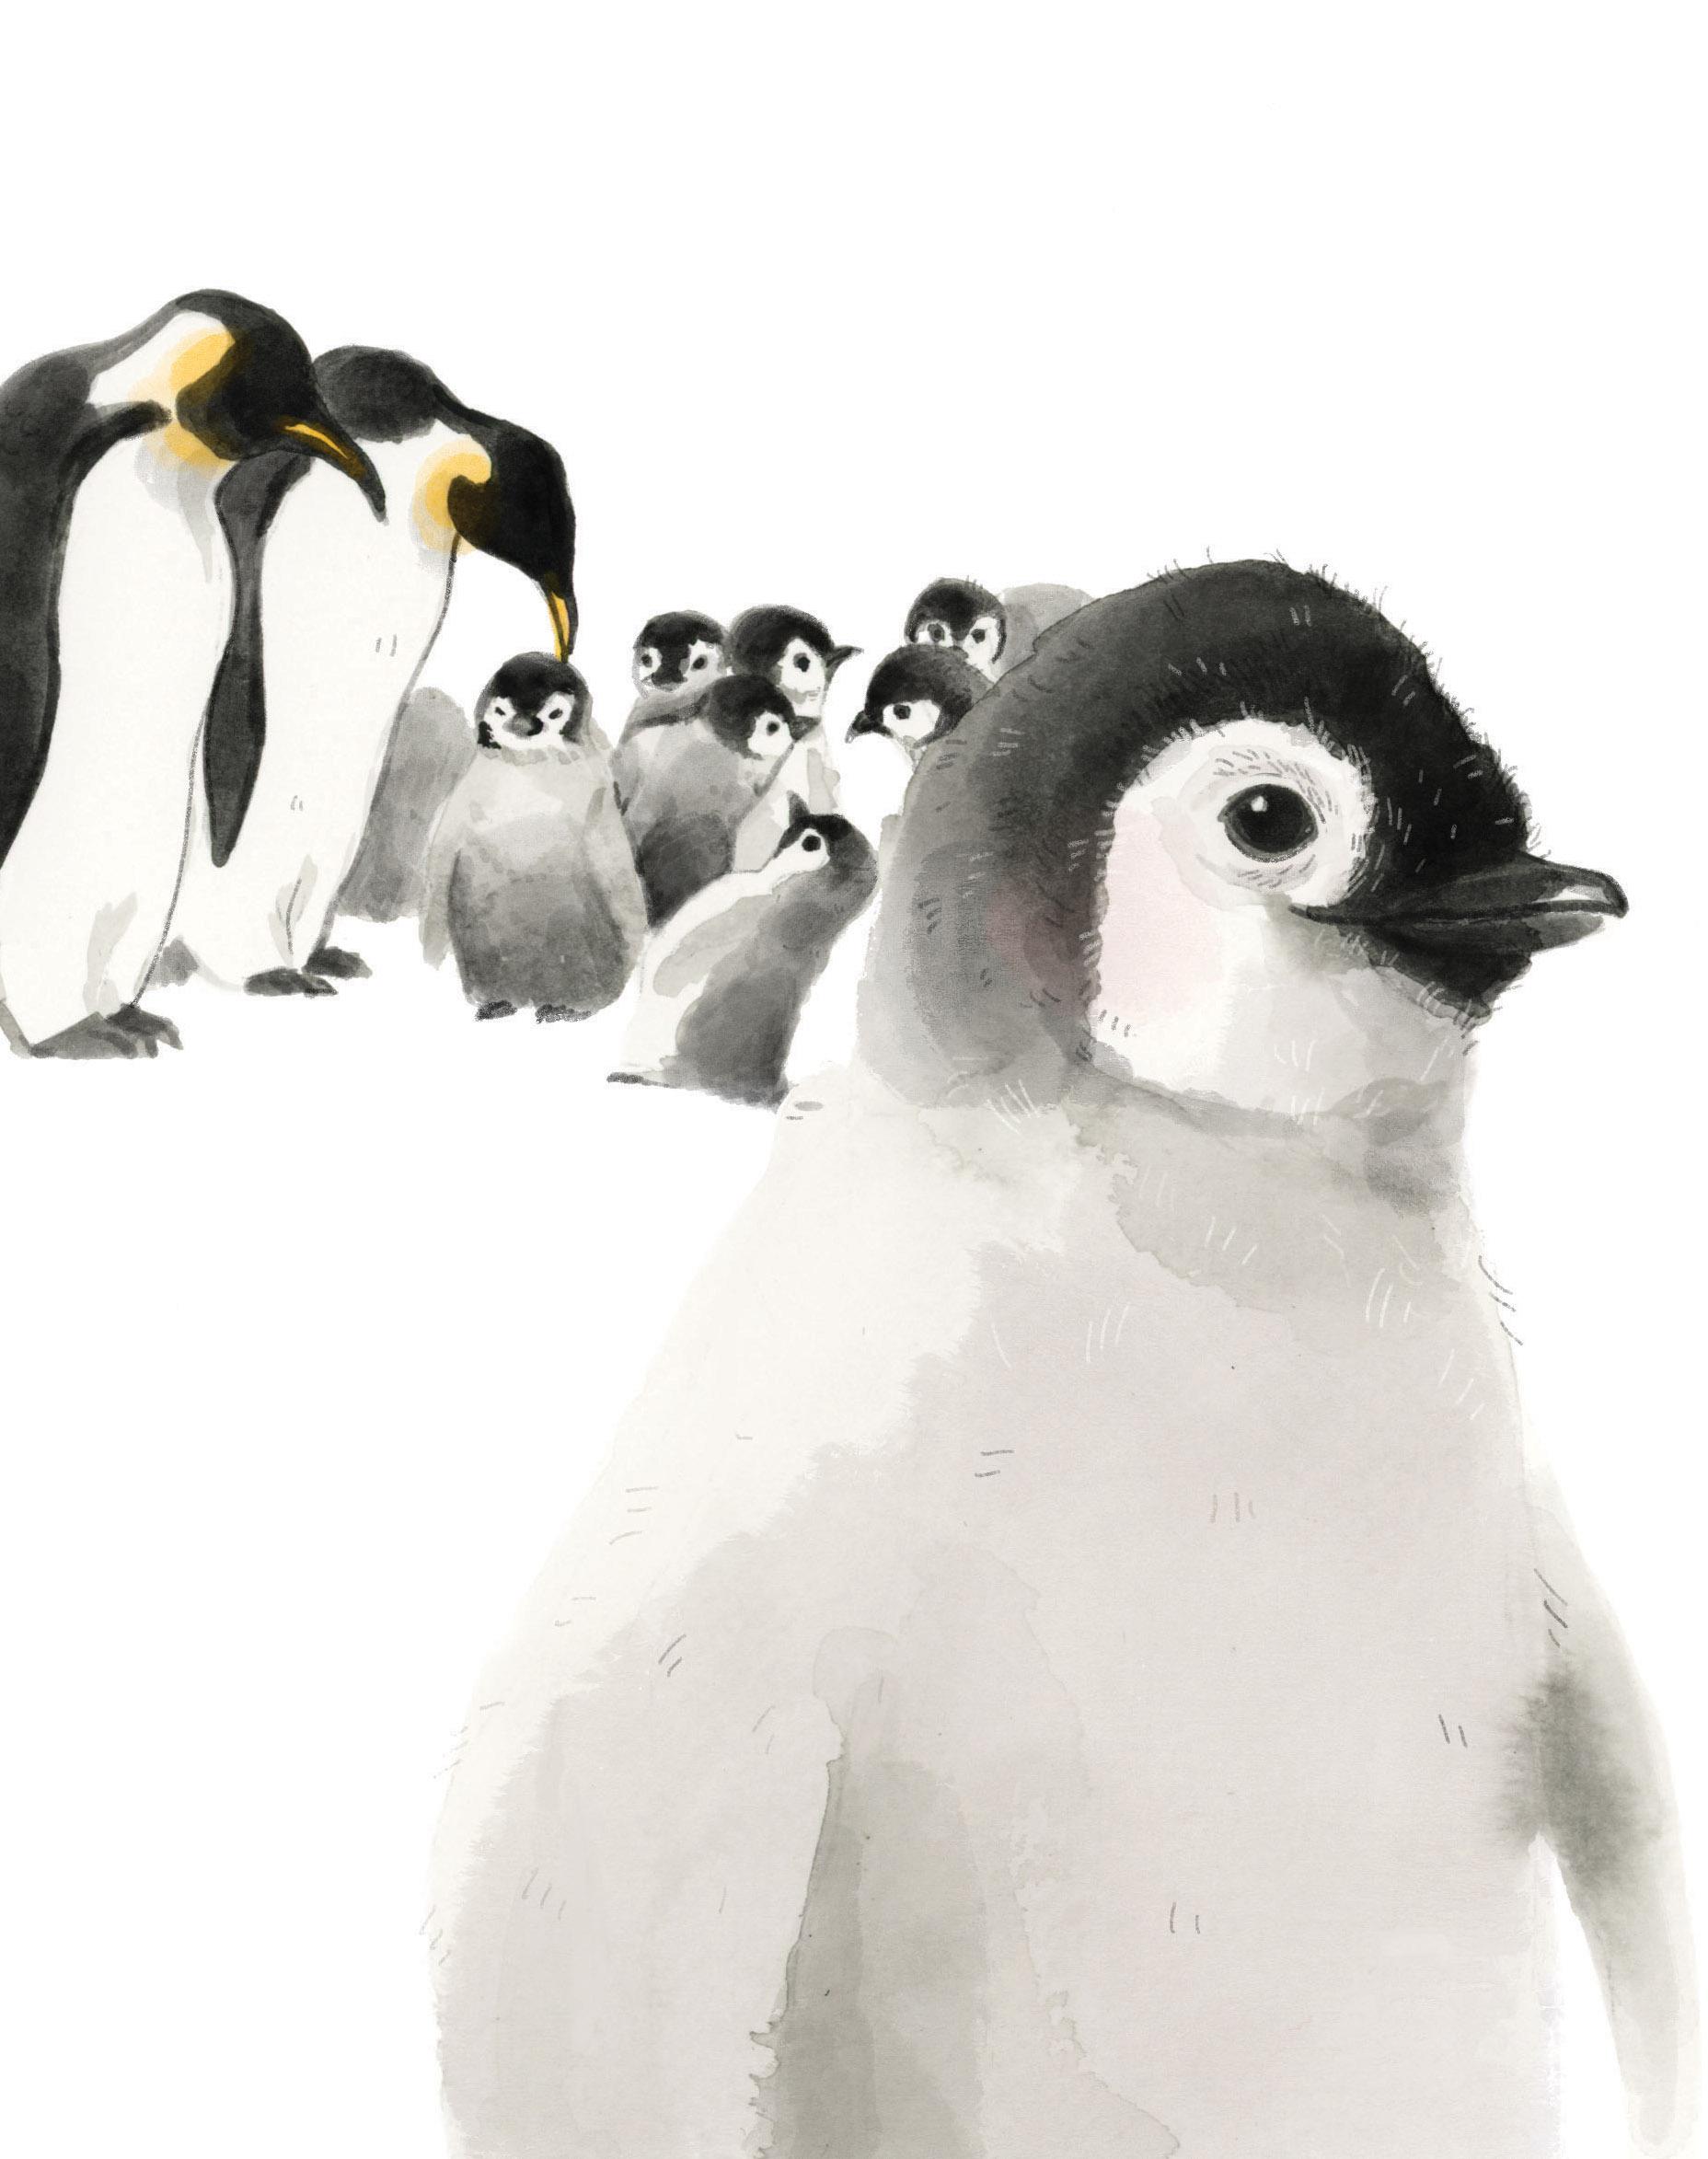 3_Pinguin_Habitat copy